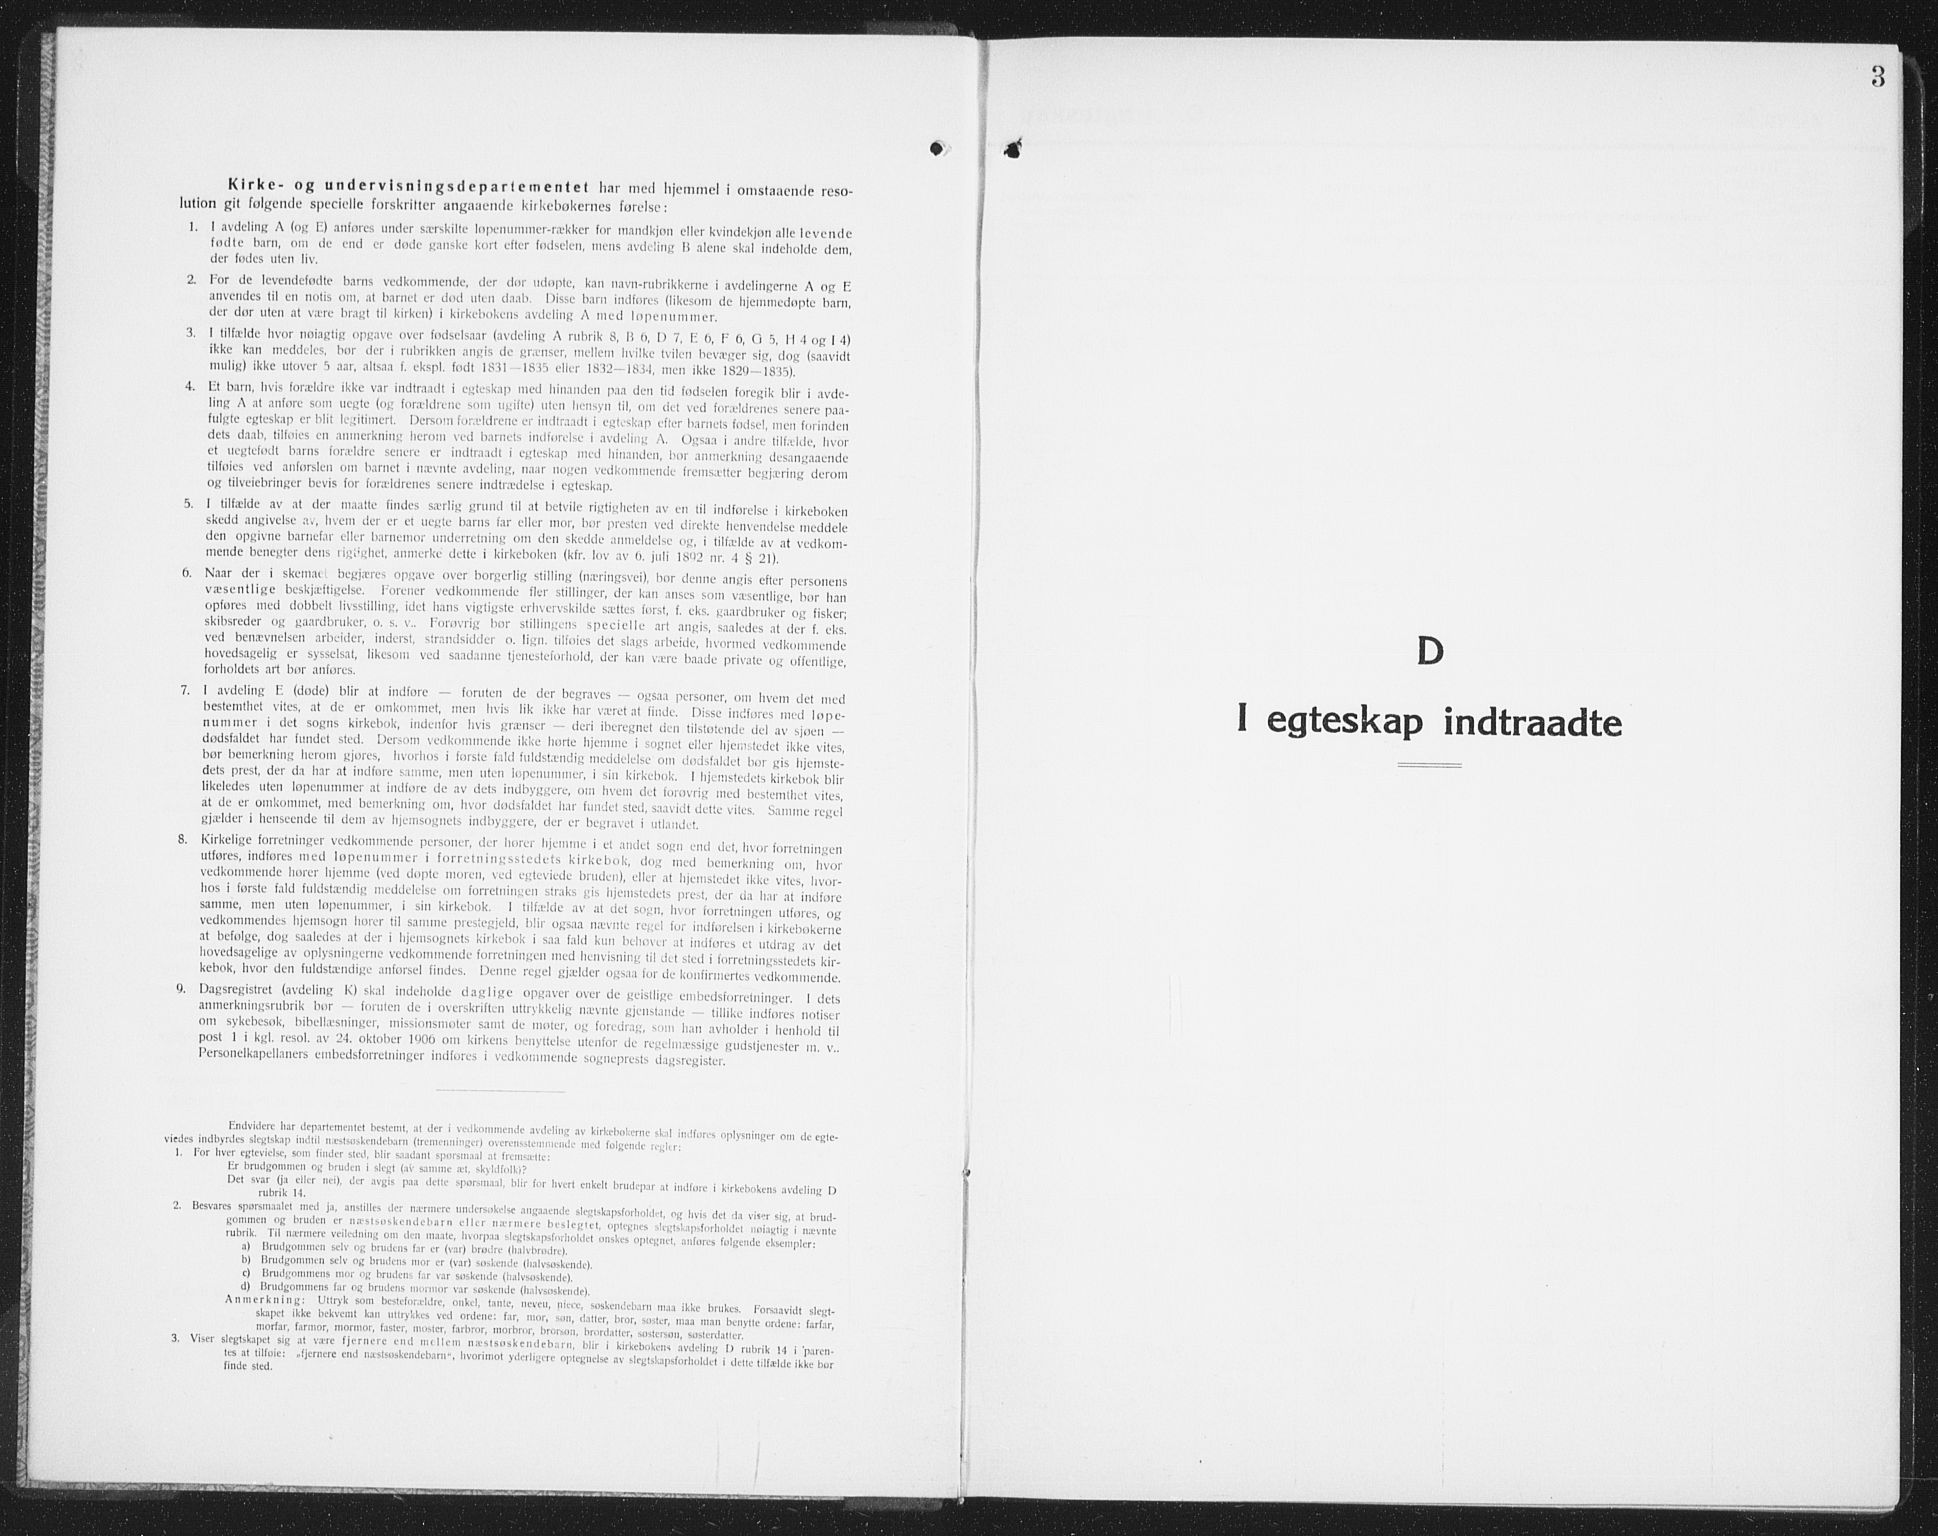 SAO, Halden prestekontor Kirkebøker, G/Ga/L0014: Klokkerbok nr. 14, 1925-1943, s. 3